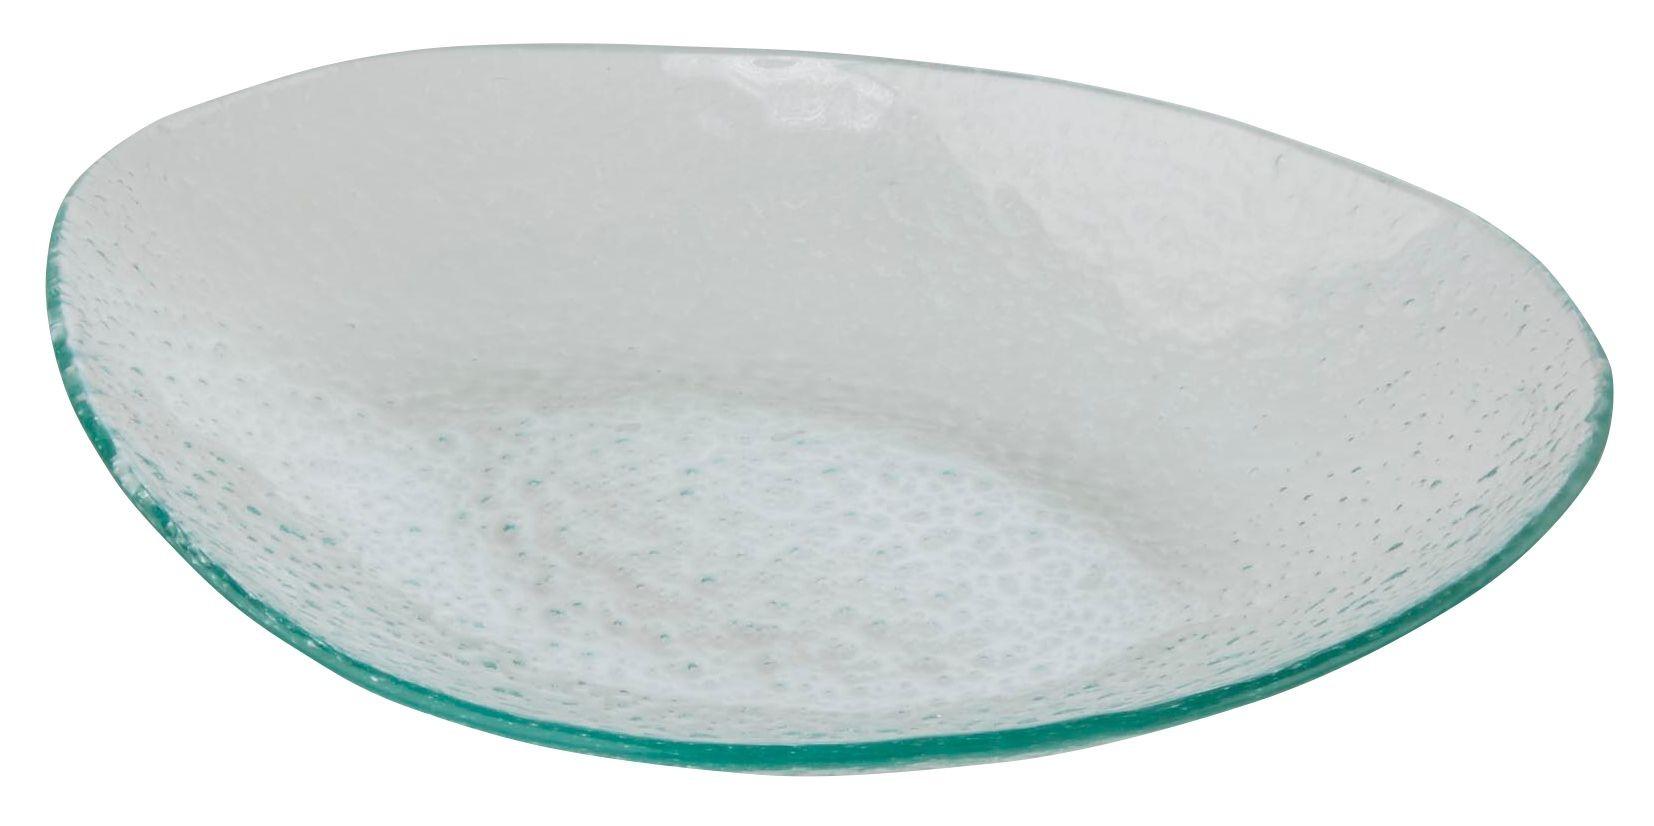 Glass Oval Plate 36 x 23.5cm